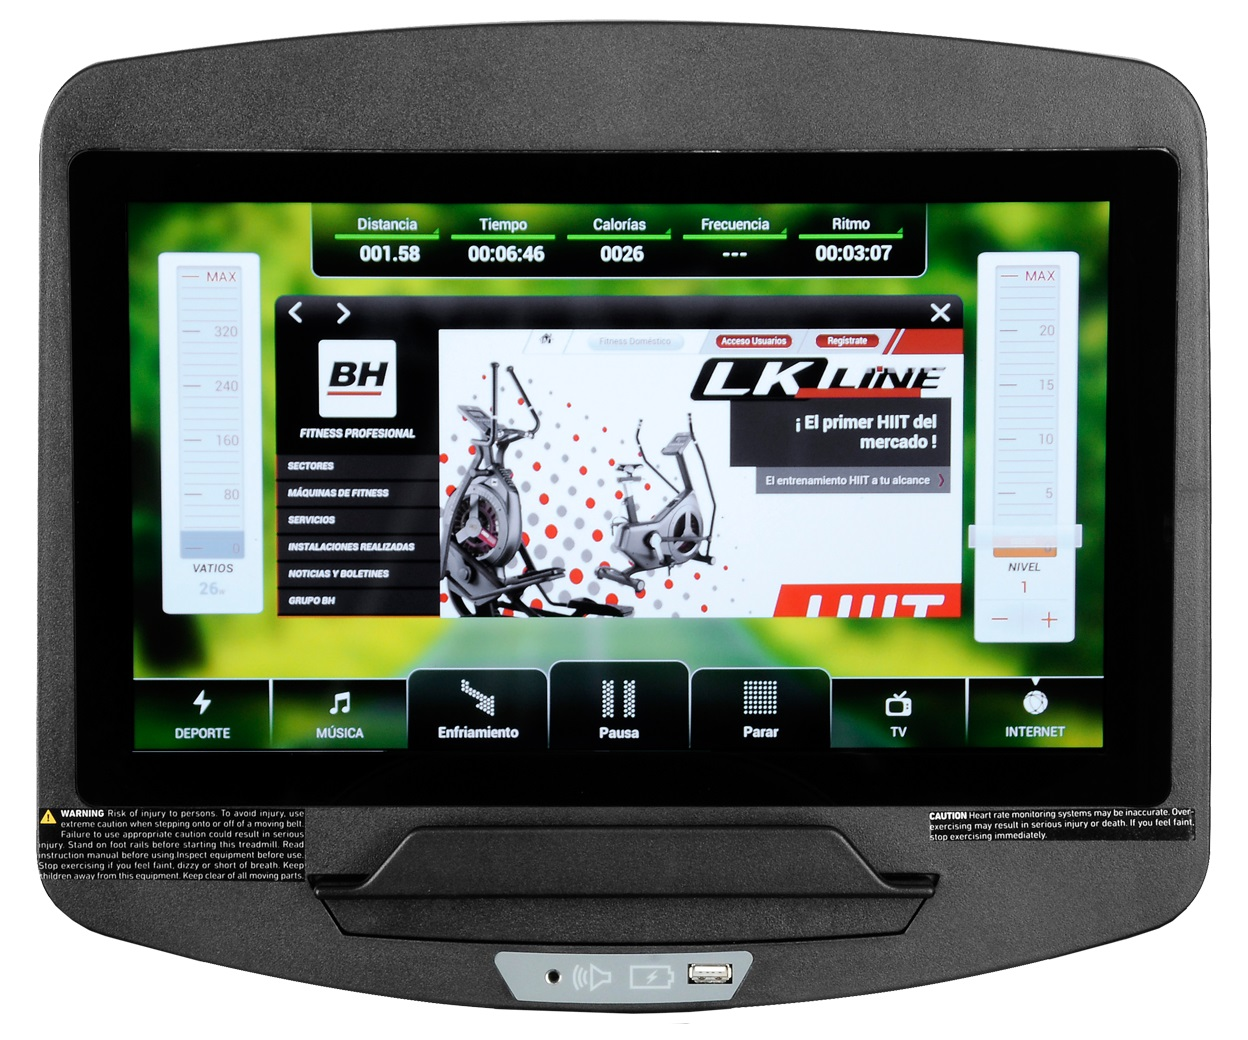 BH Fitness SK7990 SmartFocus počítač